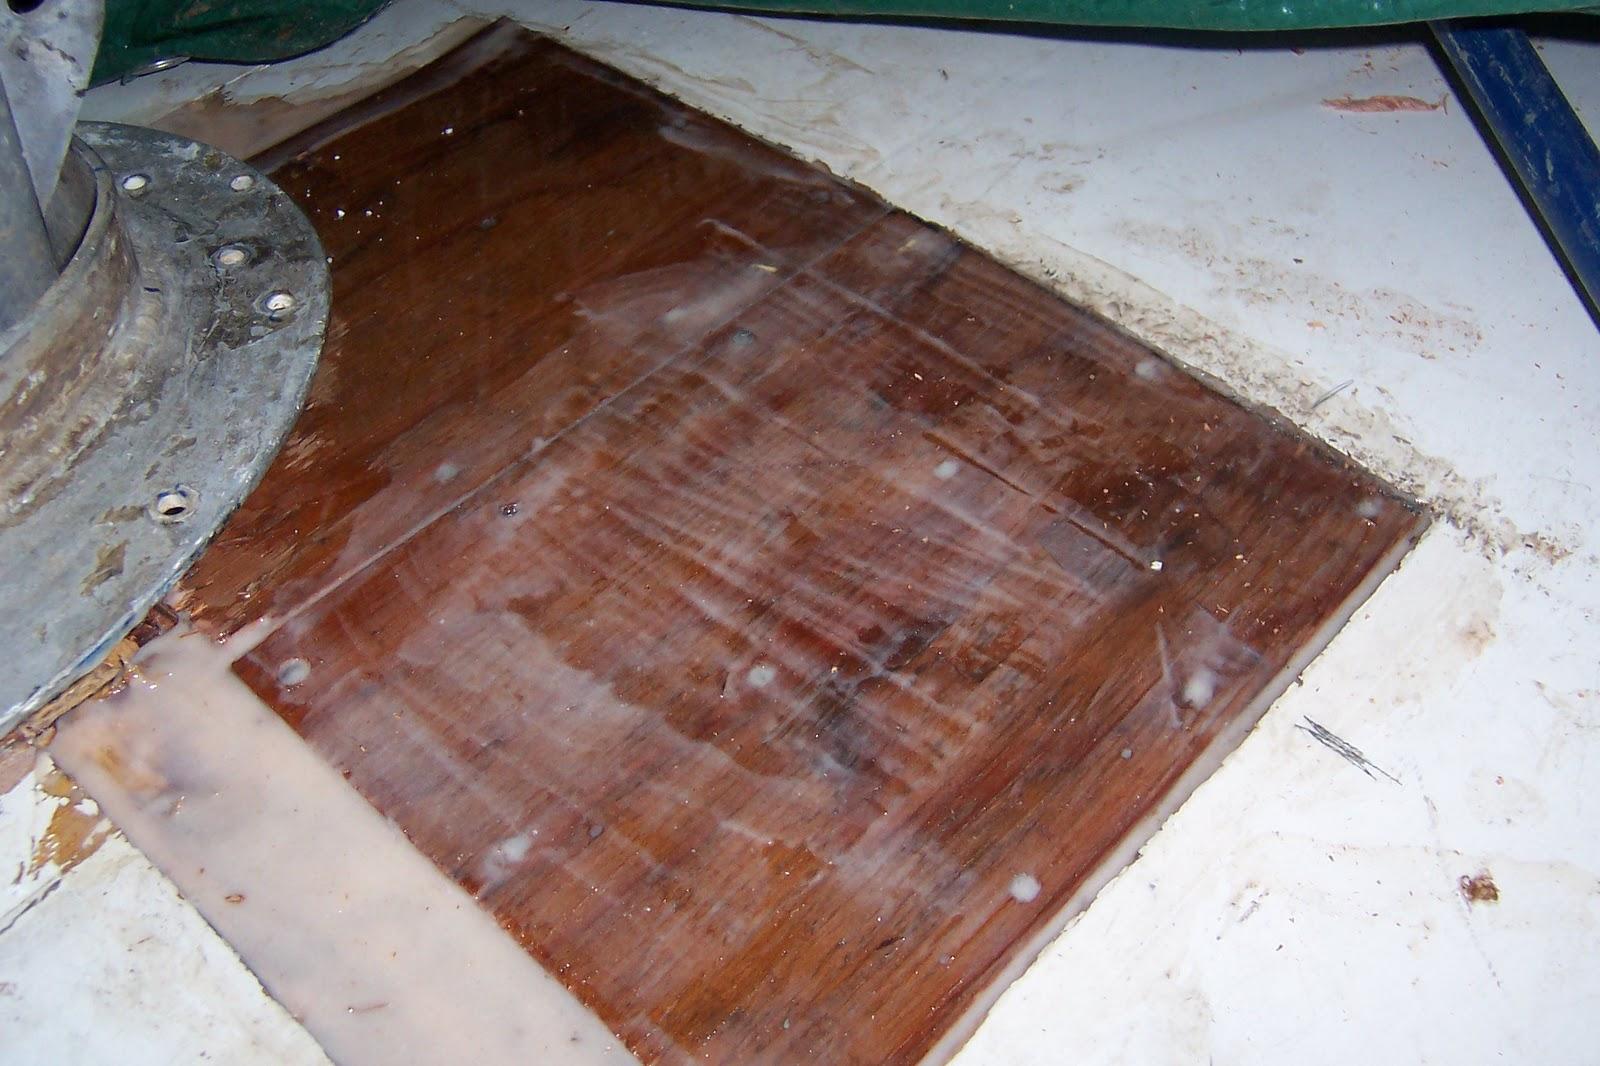 Blackheart Peterson 35 Sailboat Project Cabin Roof Rot Repair